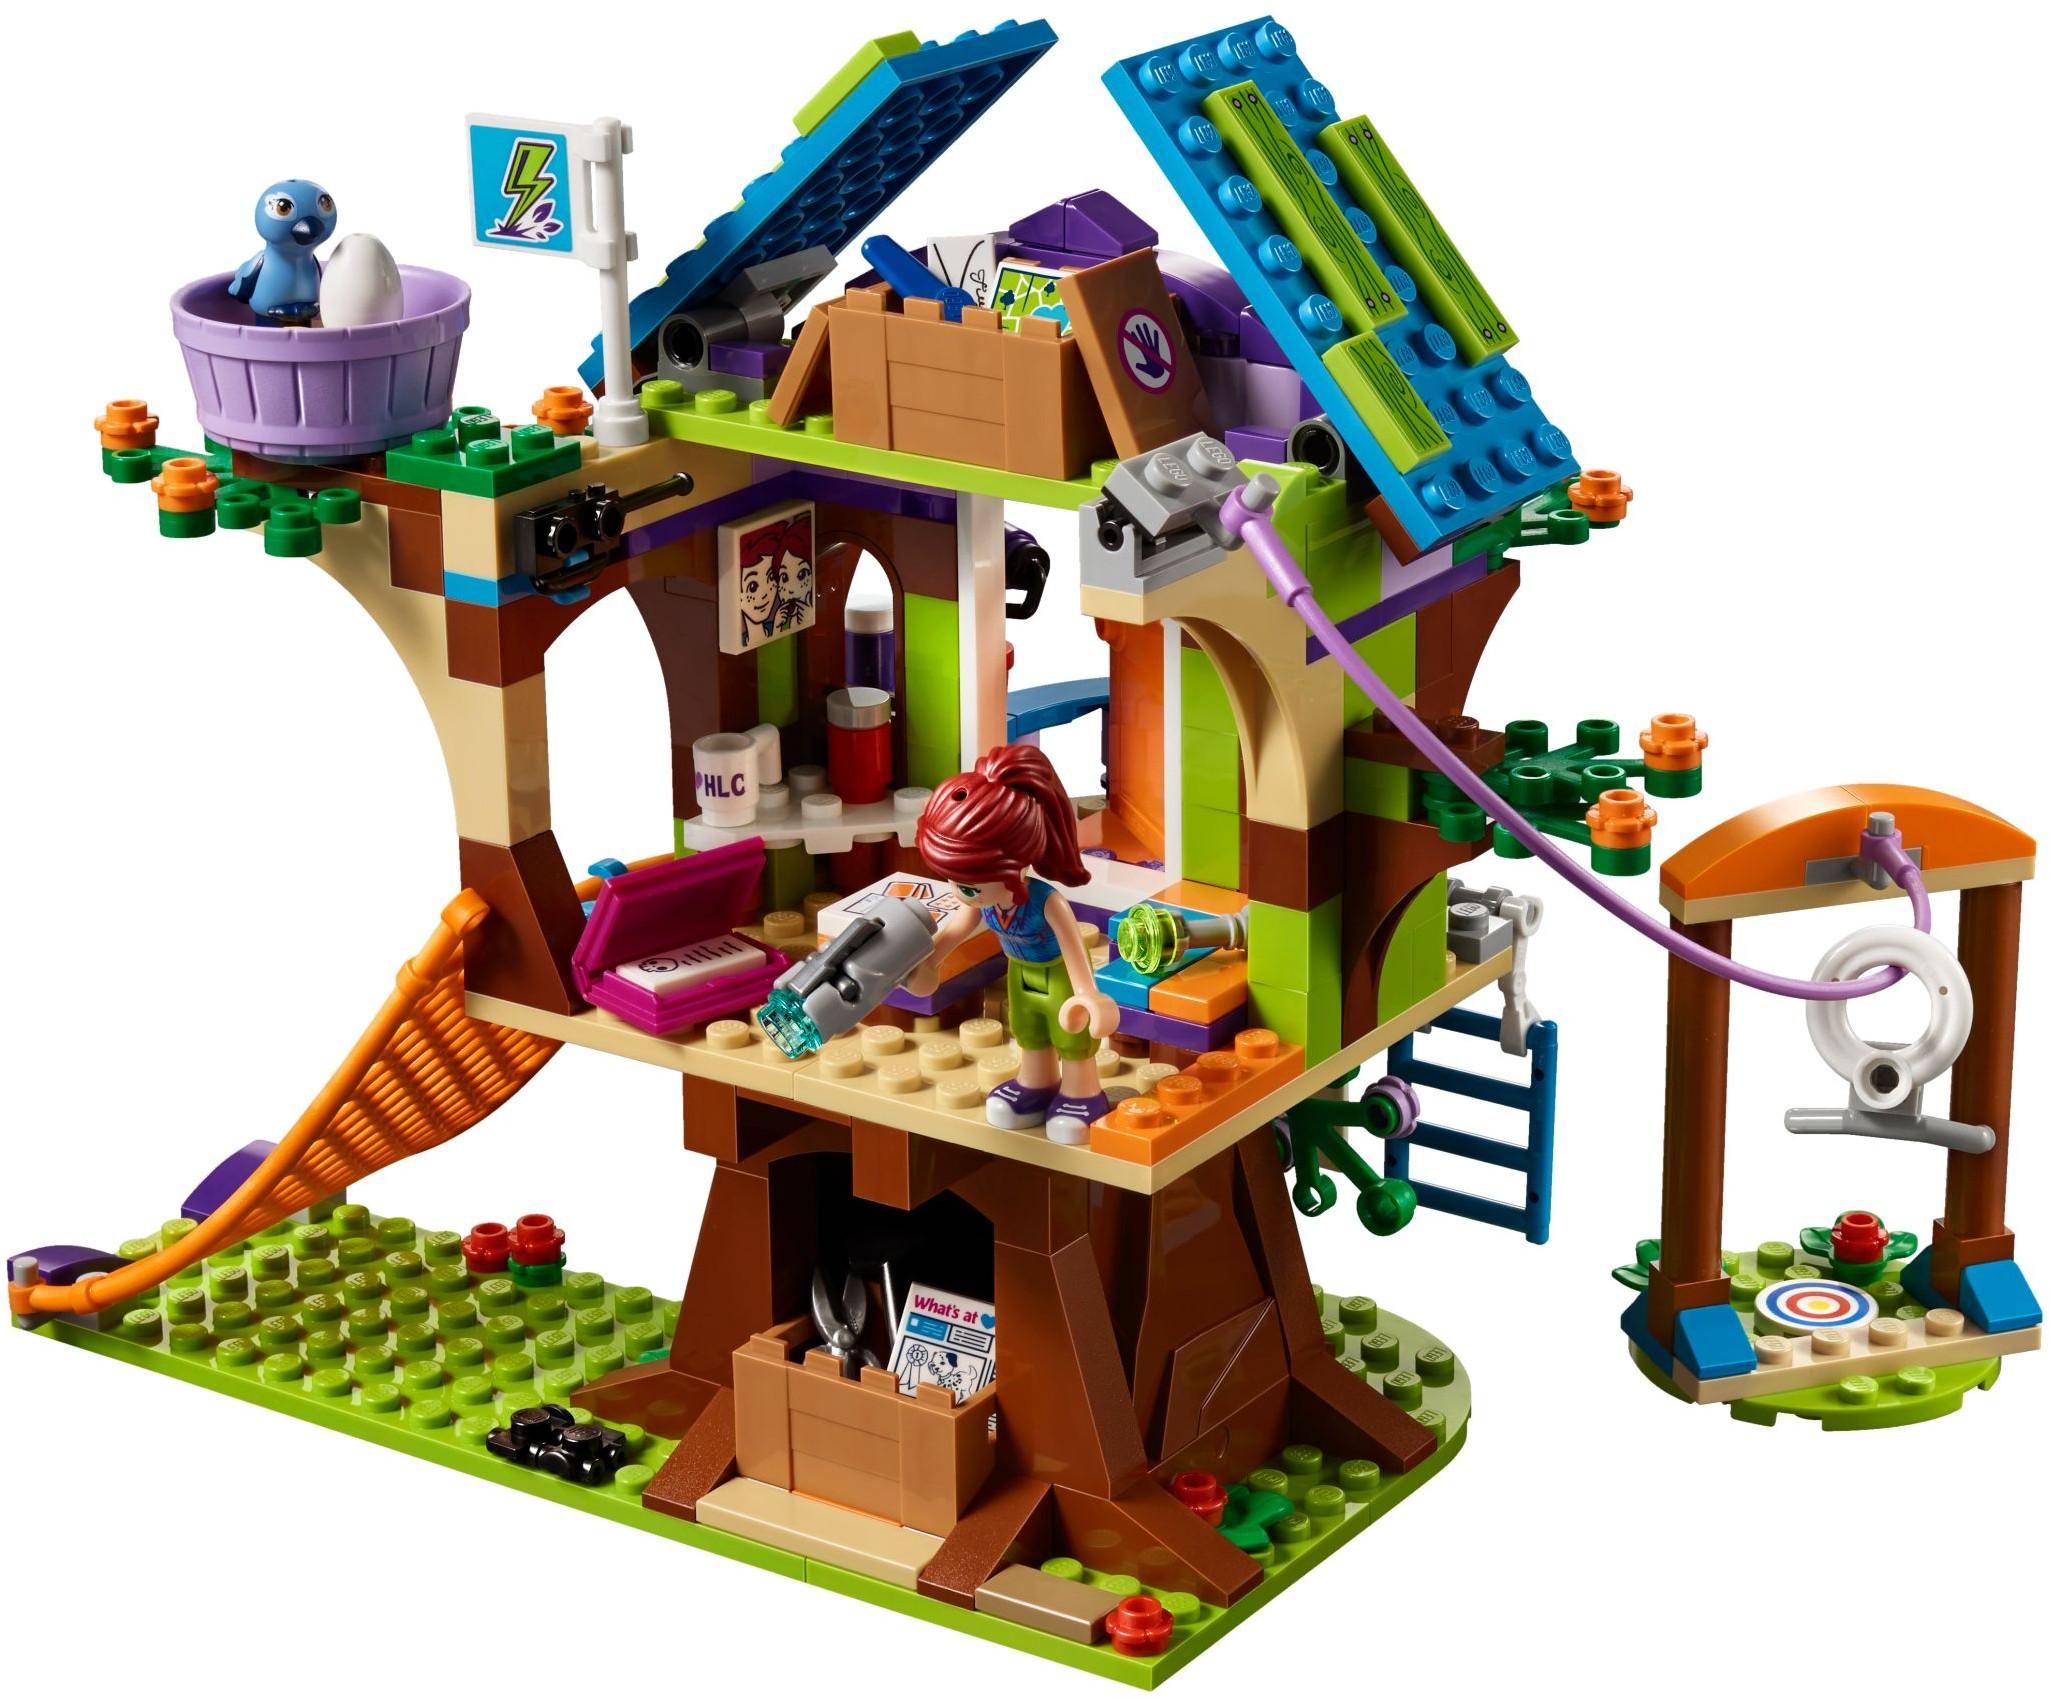 41335: LEGO® Friends Mia's Tree House / Mias Baumhaus ...